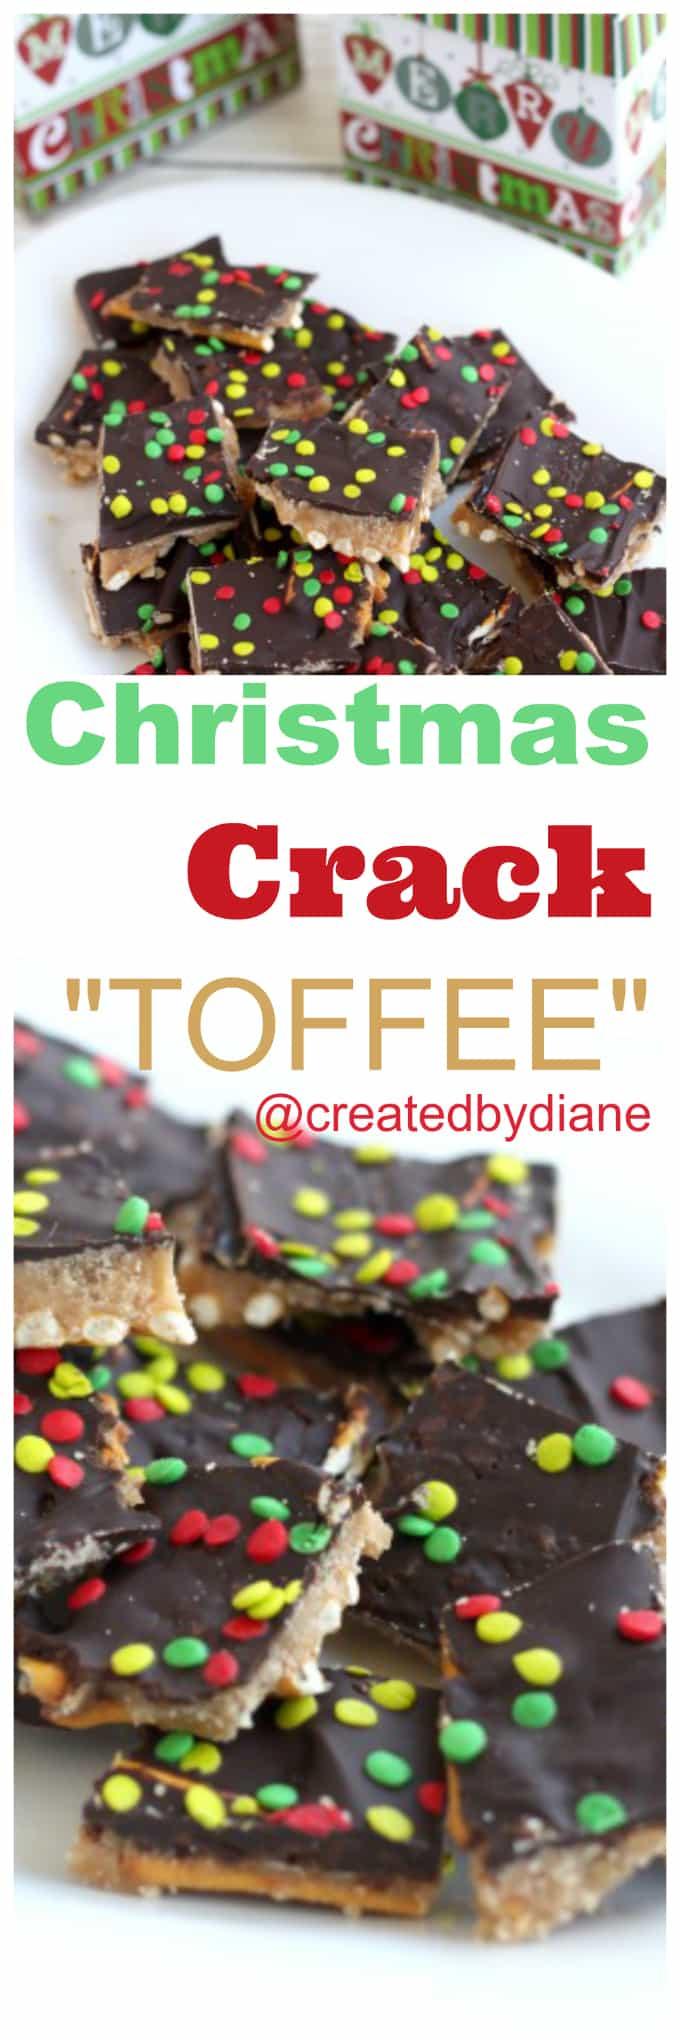 christmas-crack-toffee-www-createdby-diane-com